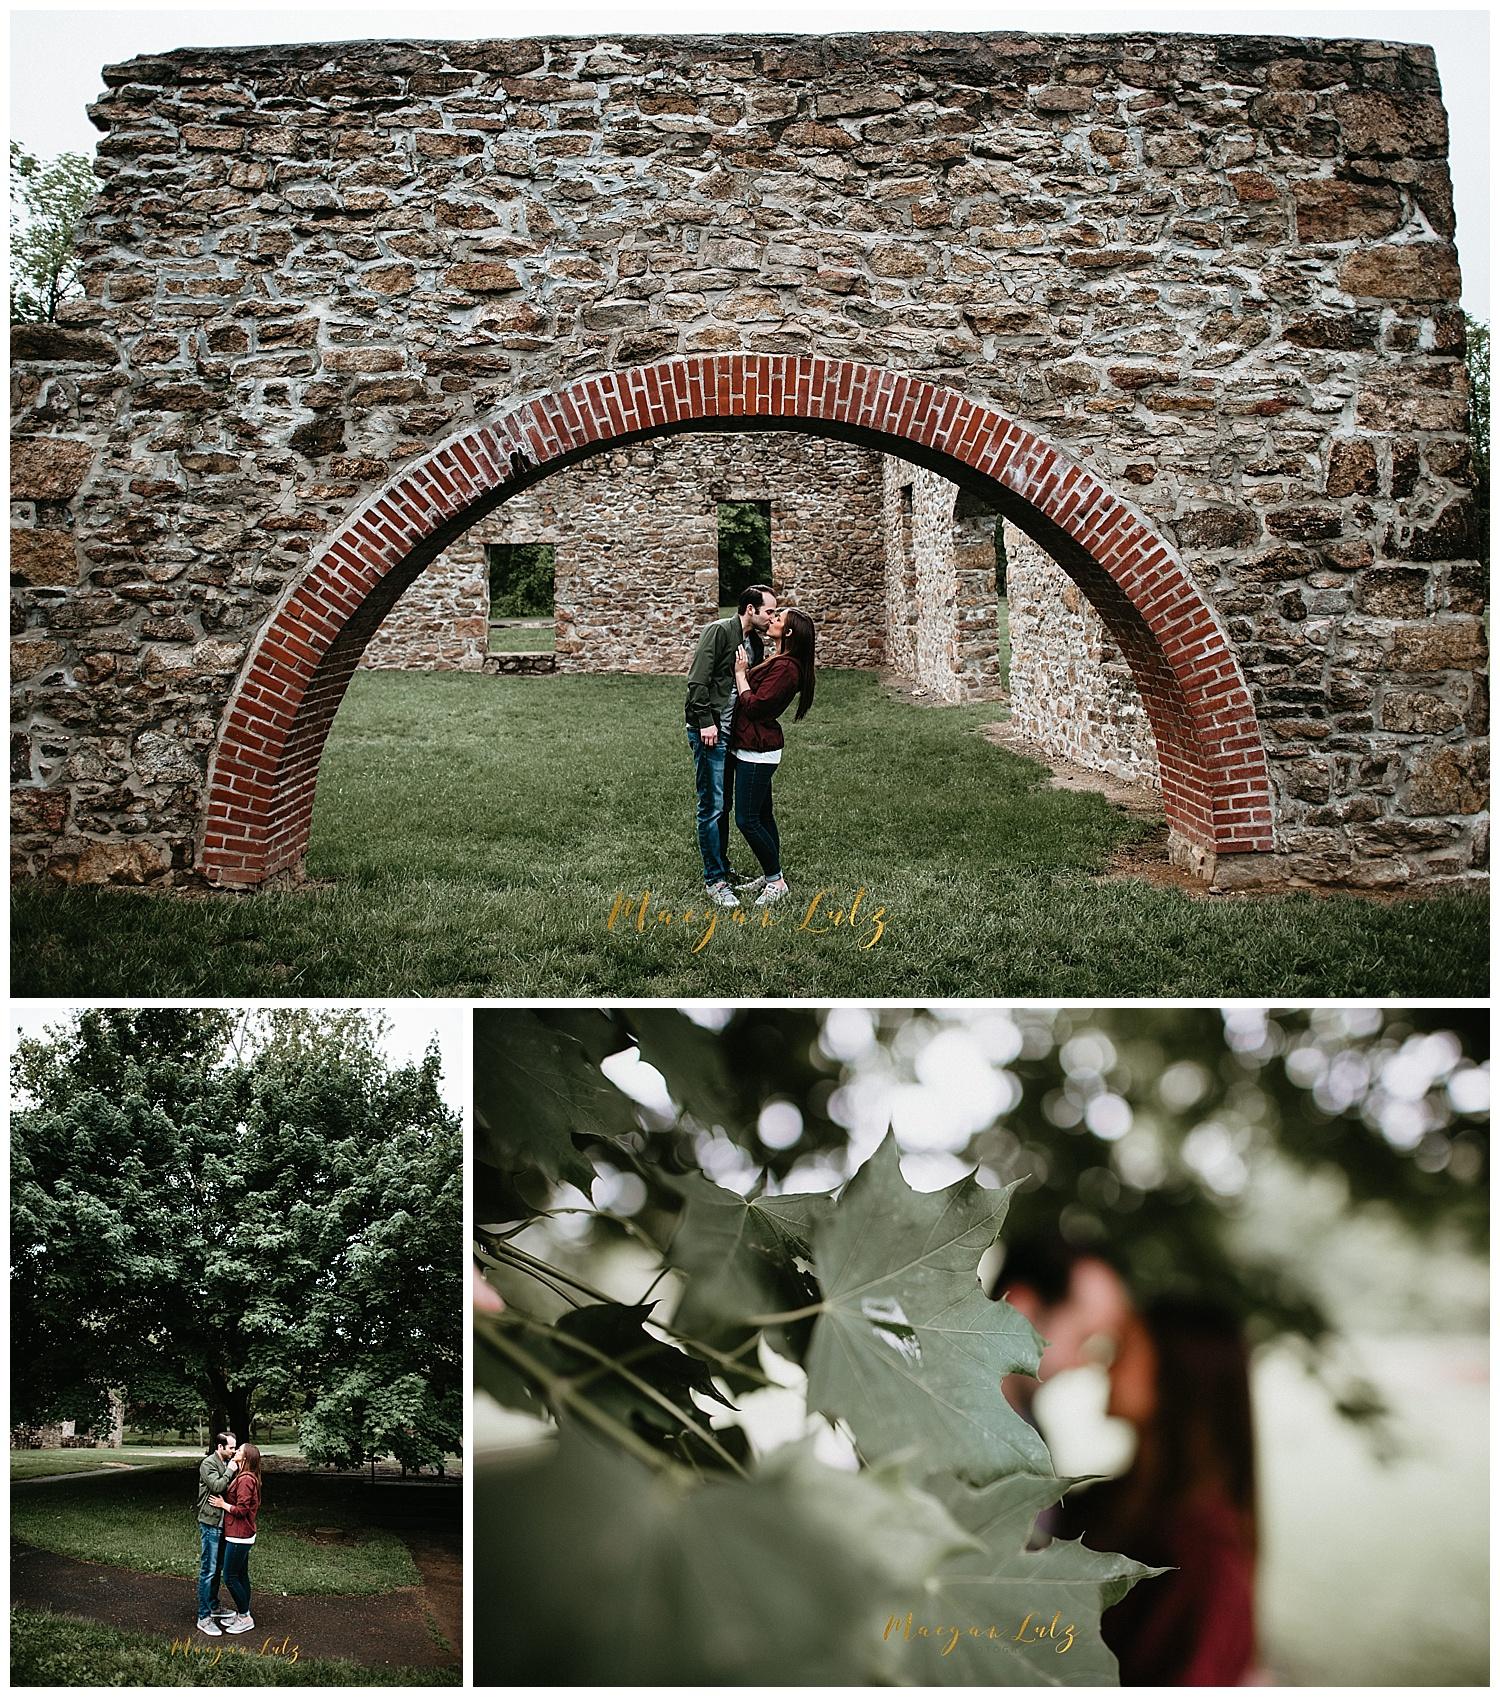 NEPA-wedding-engagement-photographer-Lockridge-park-Alburtis-PA_0035.jpg